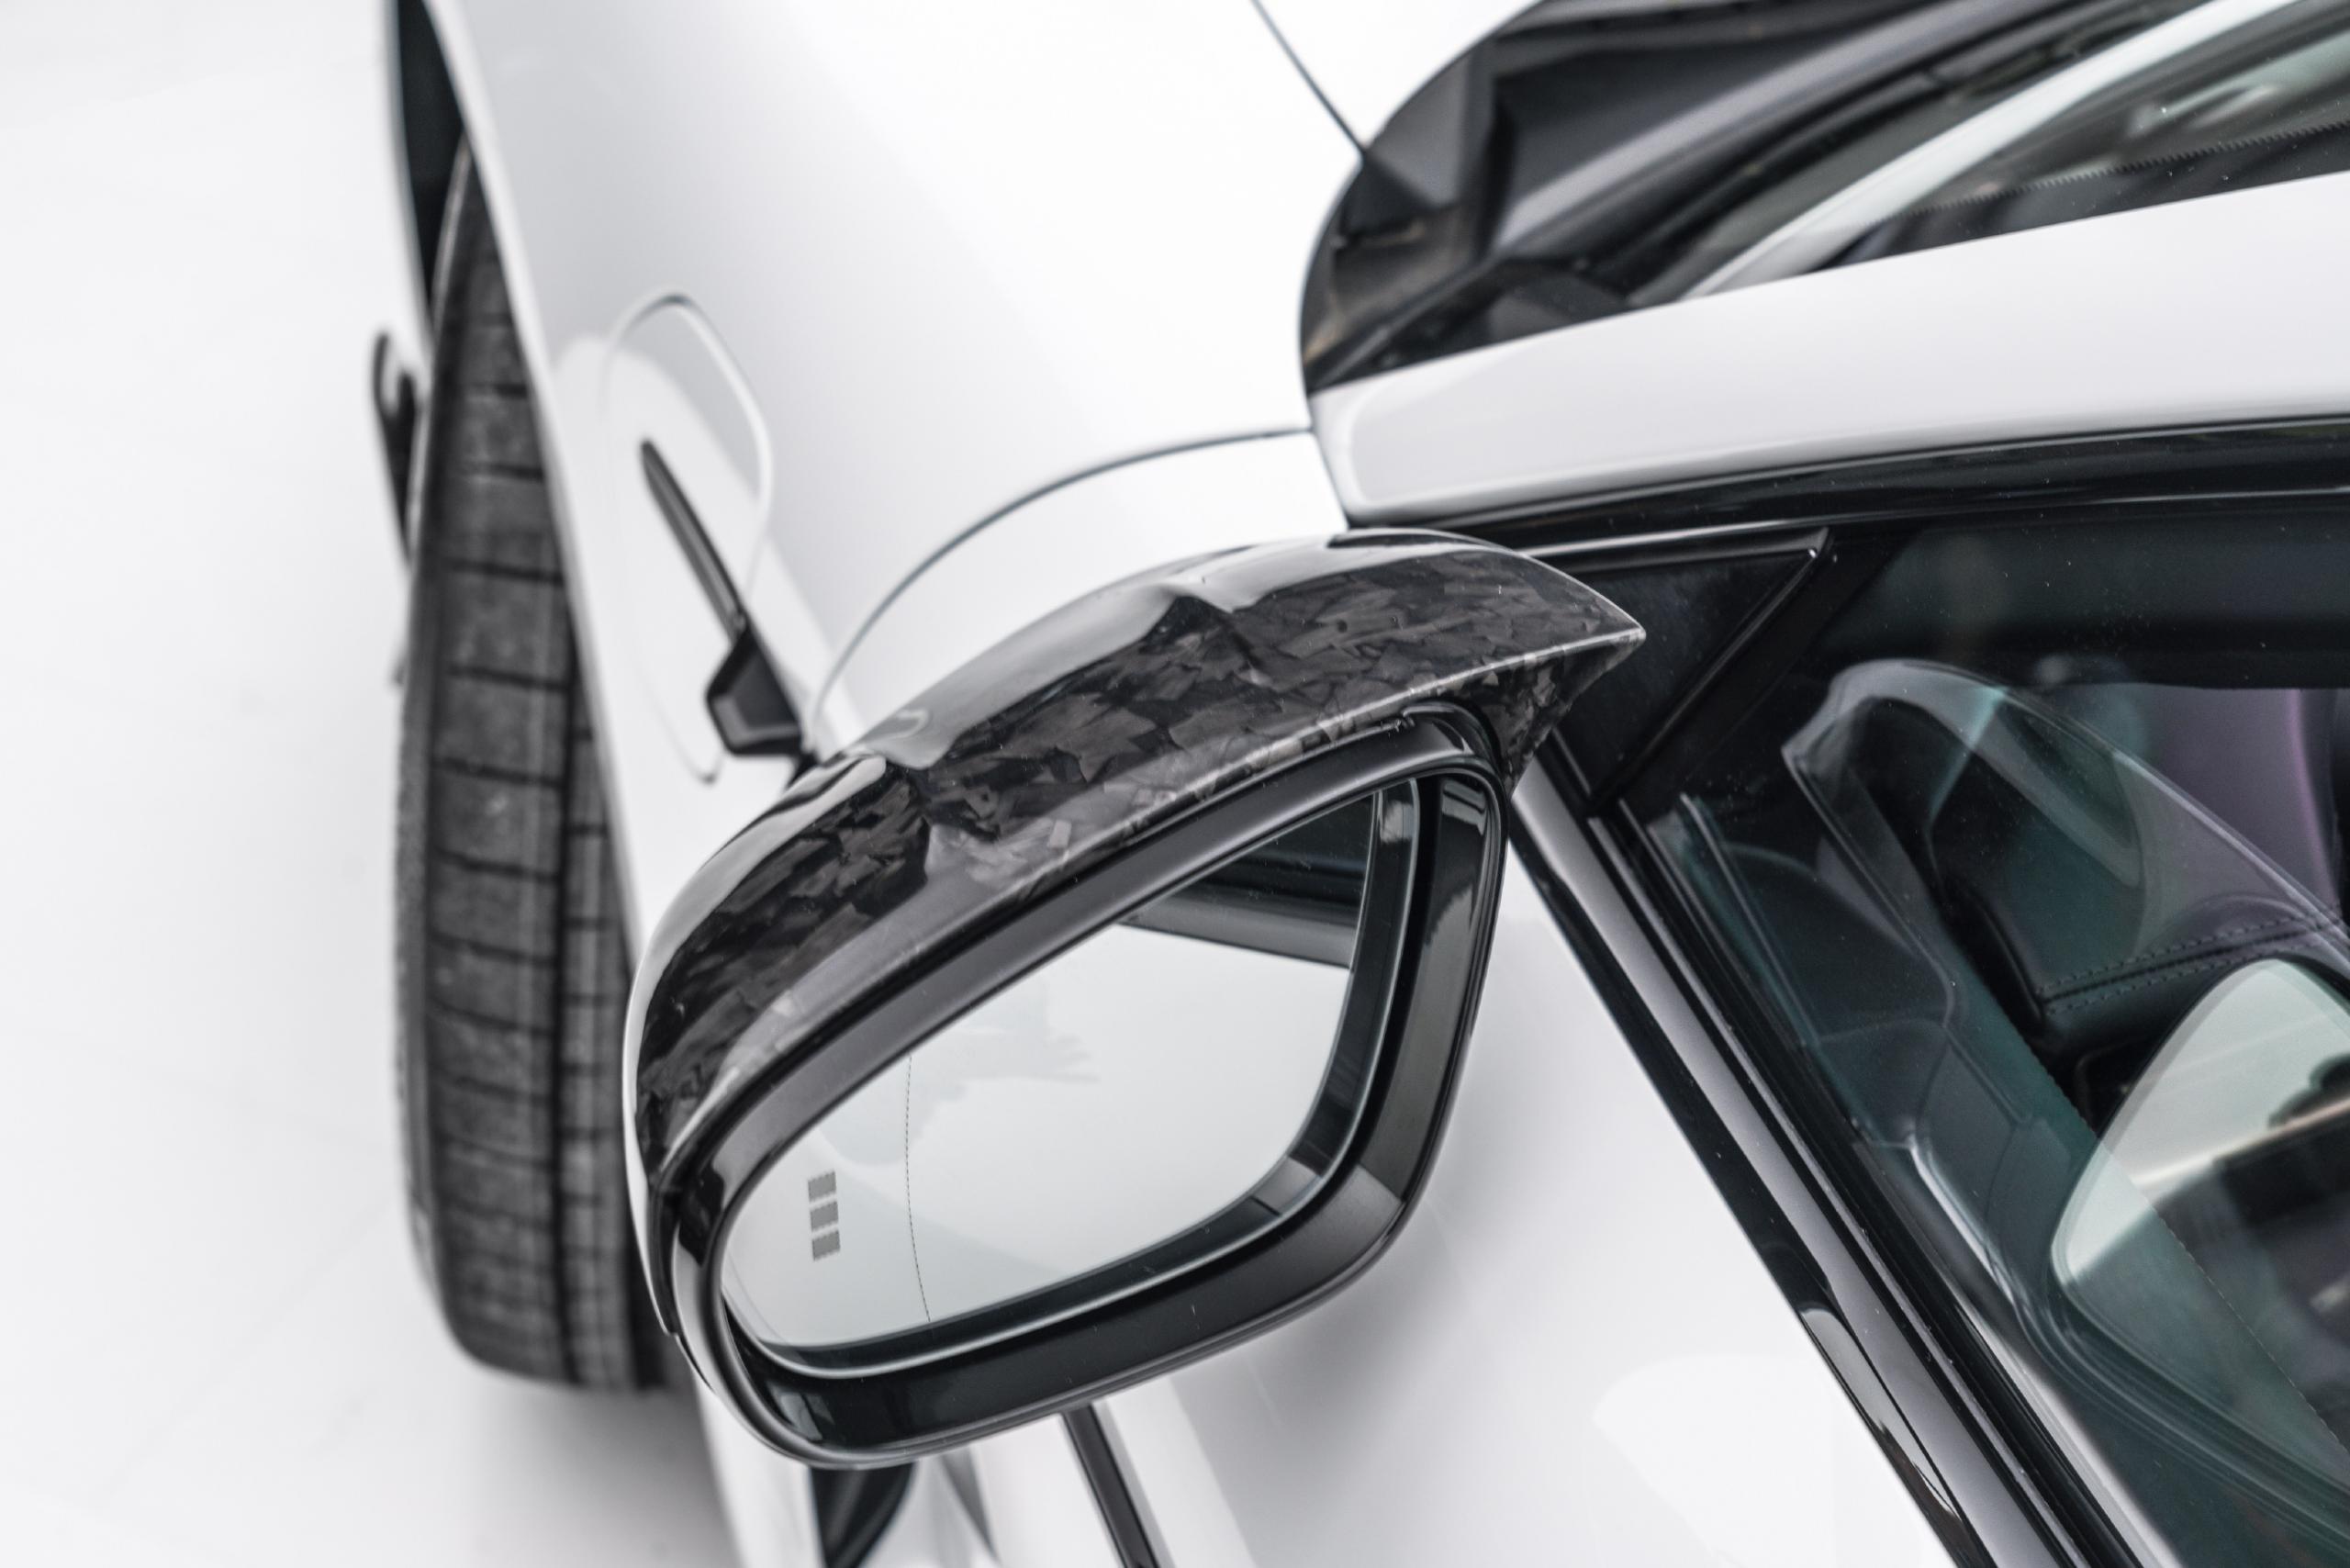 mansory porsche taycan carbon fiber body kit mirror cover rear 2020 2021